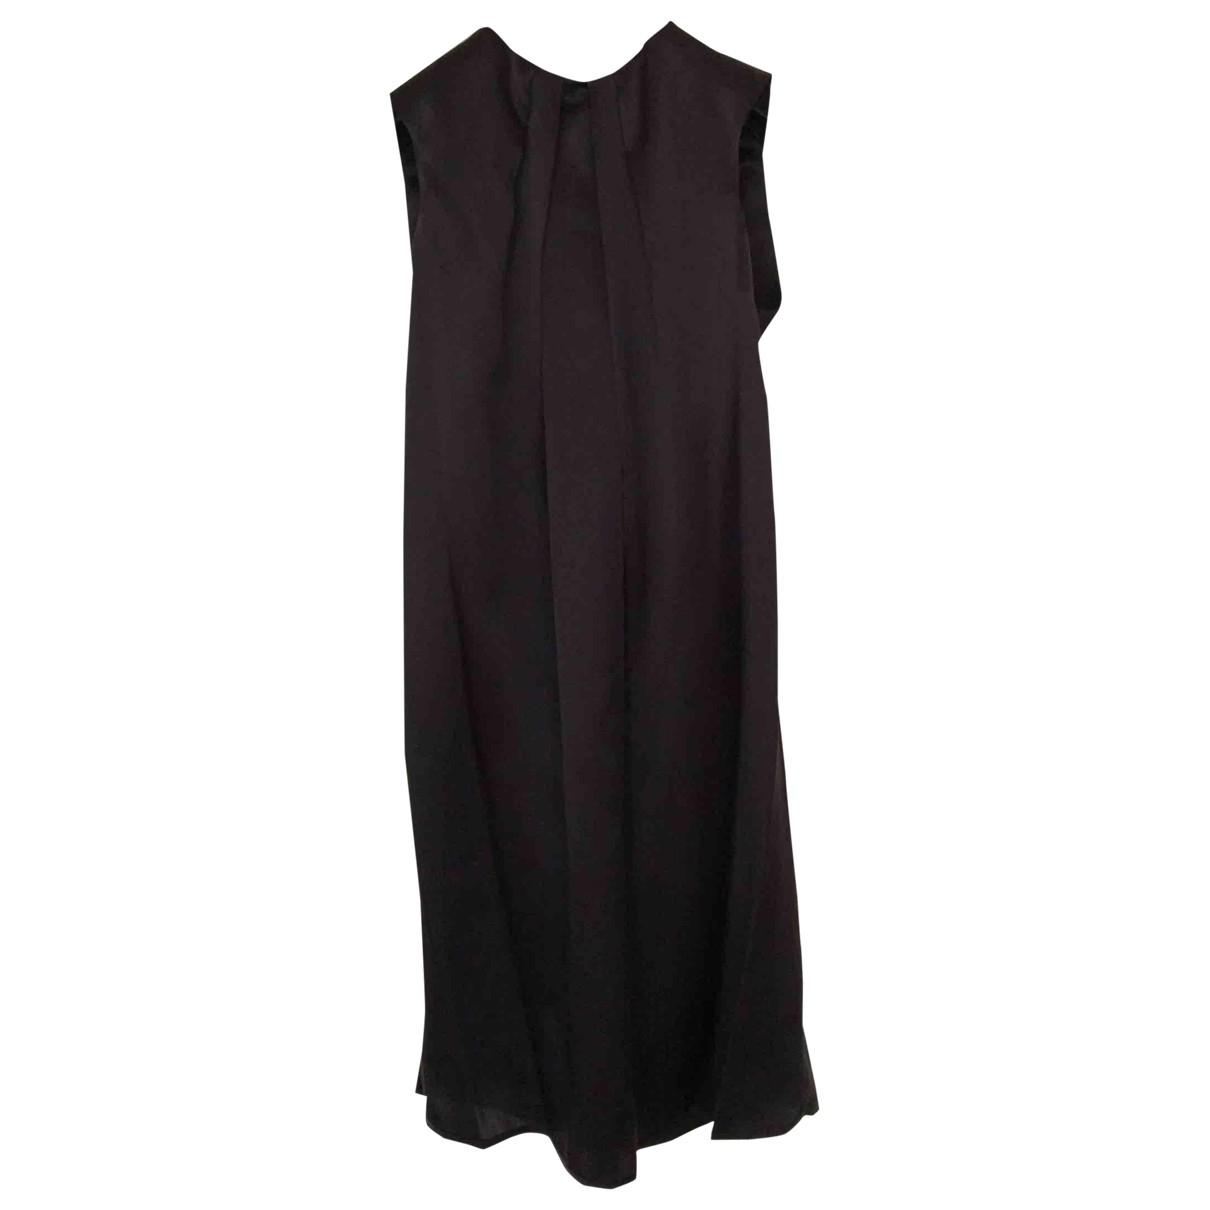 Tara Jarmon \N Brown Silk dress for Women 38 FR